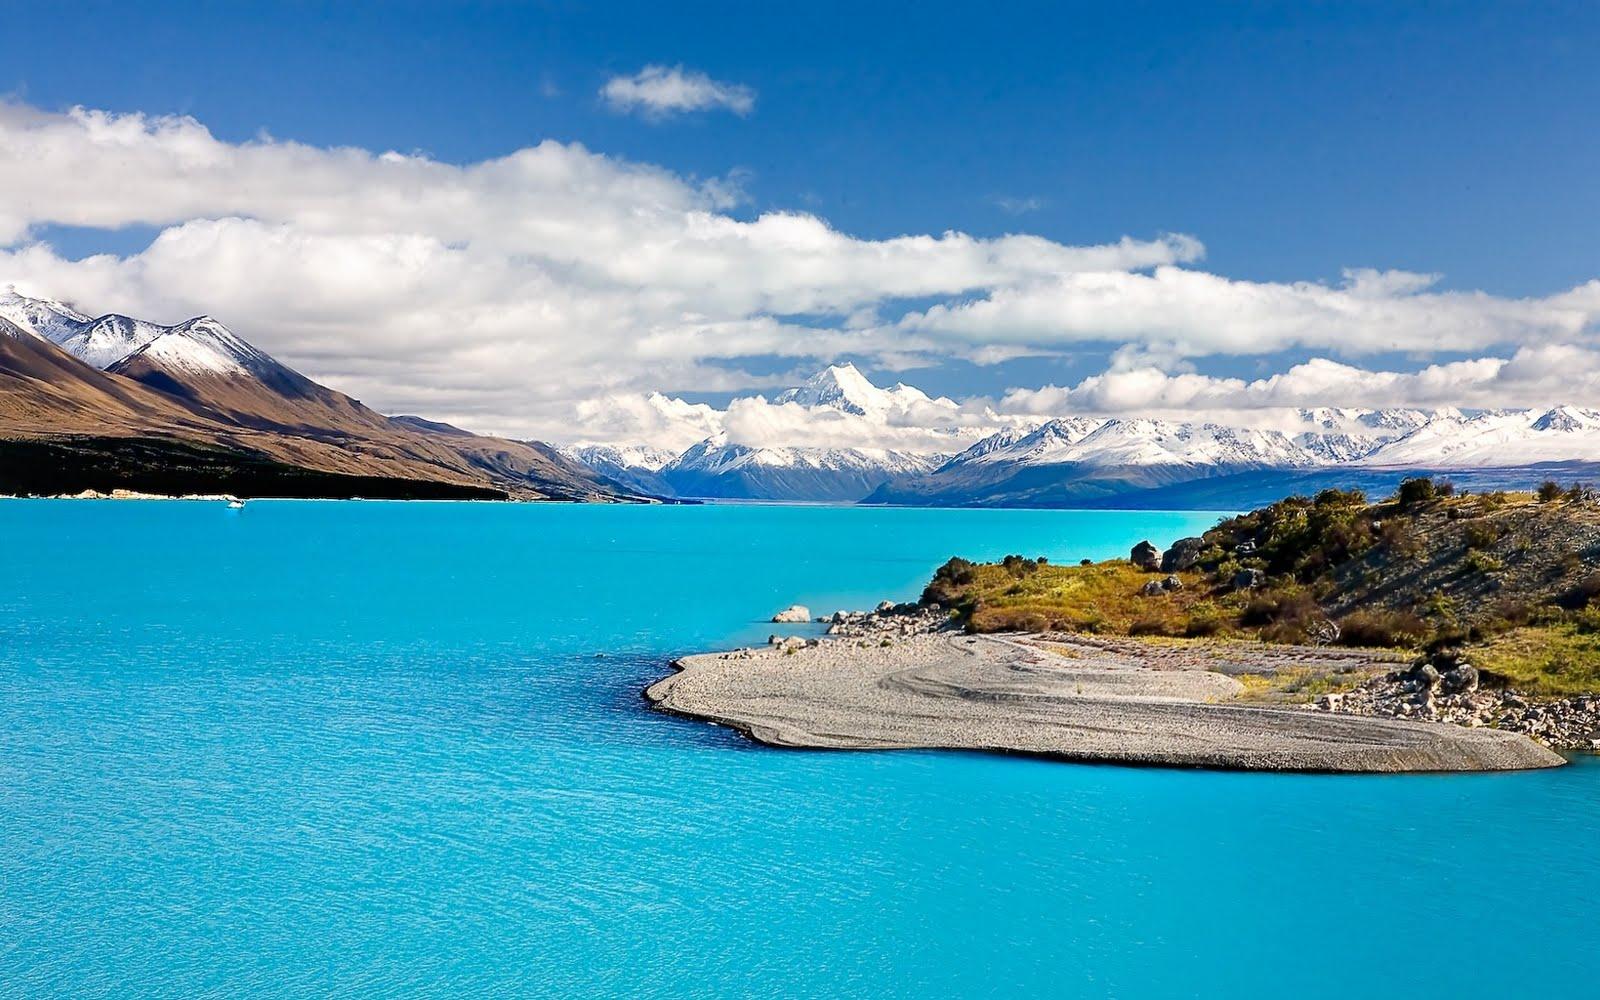 Mar azul celeste